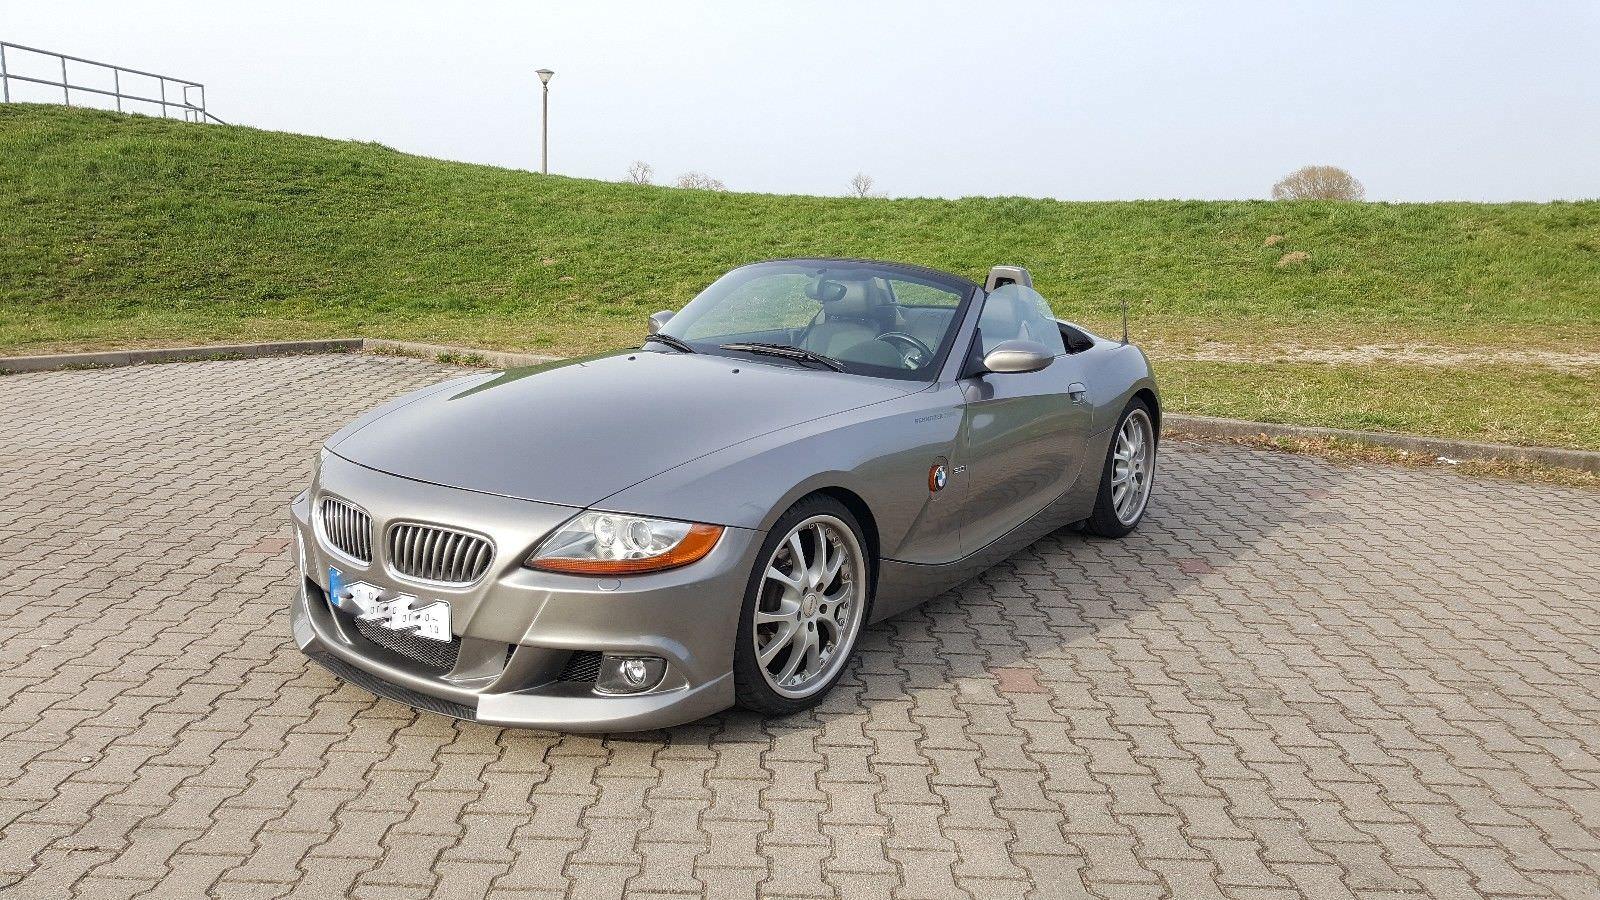 Aufbereitung des BMW Z4 3.0 SMG